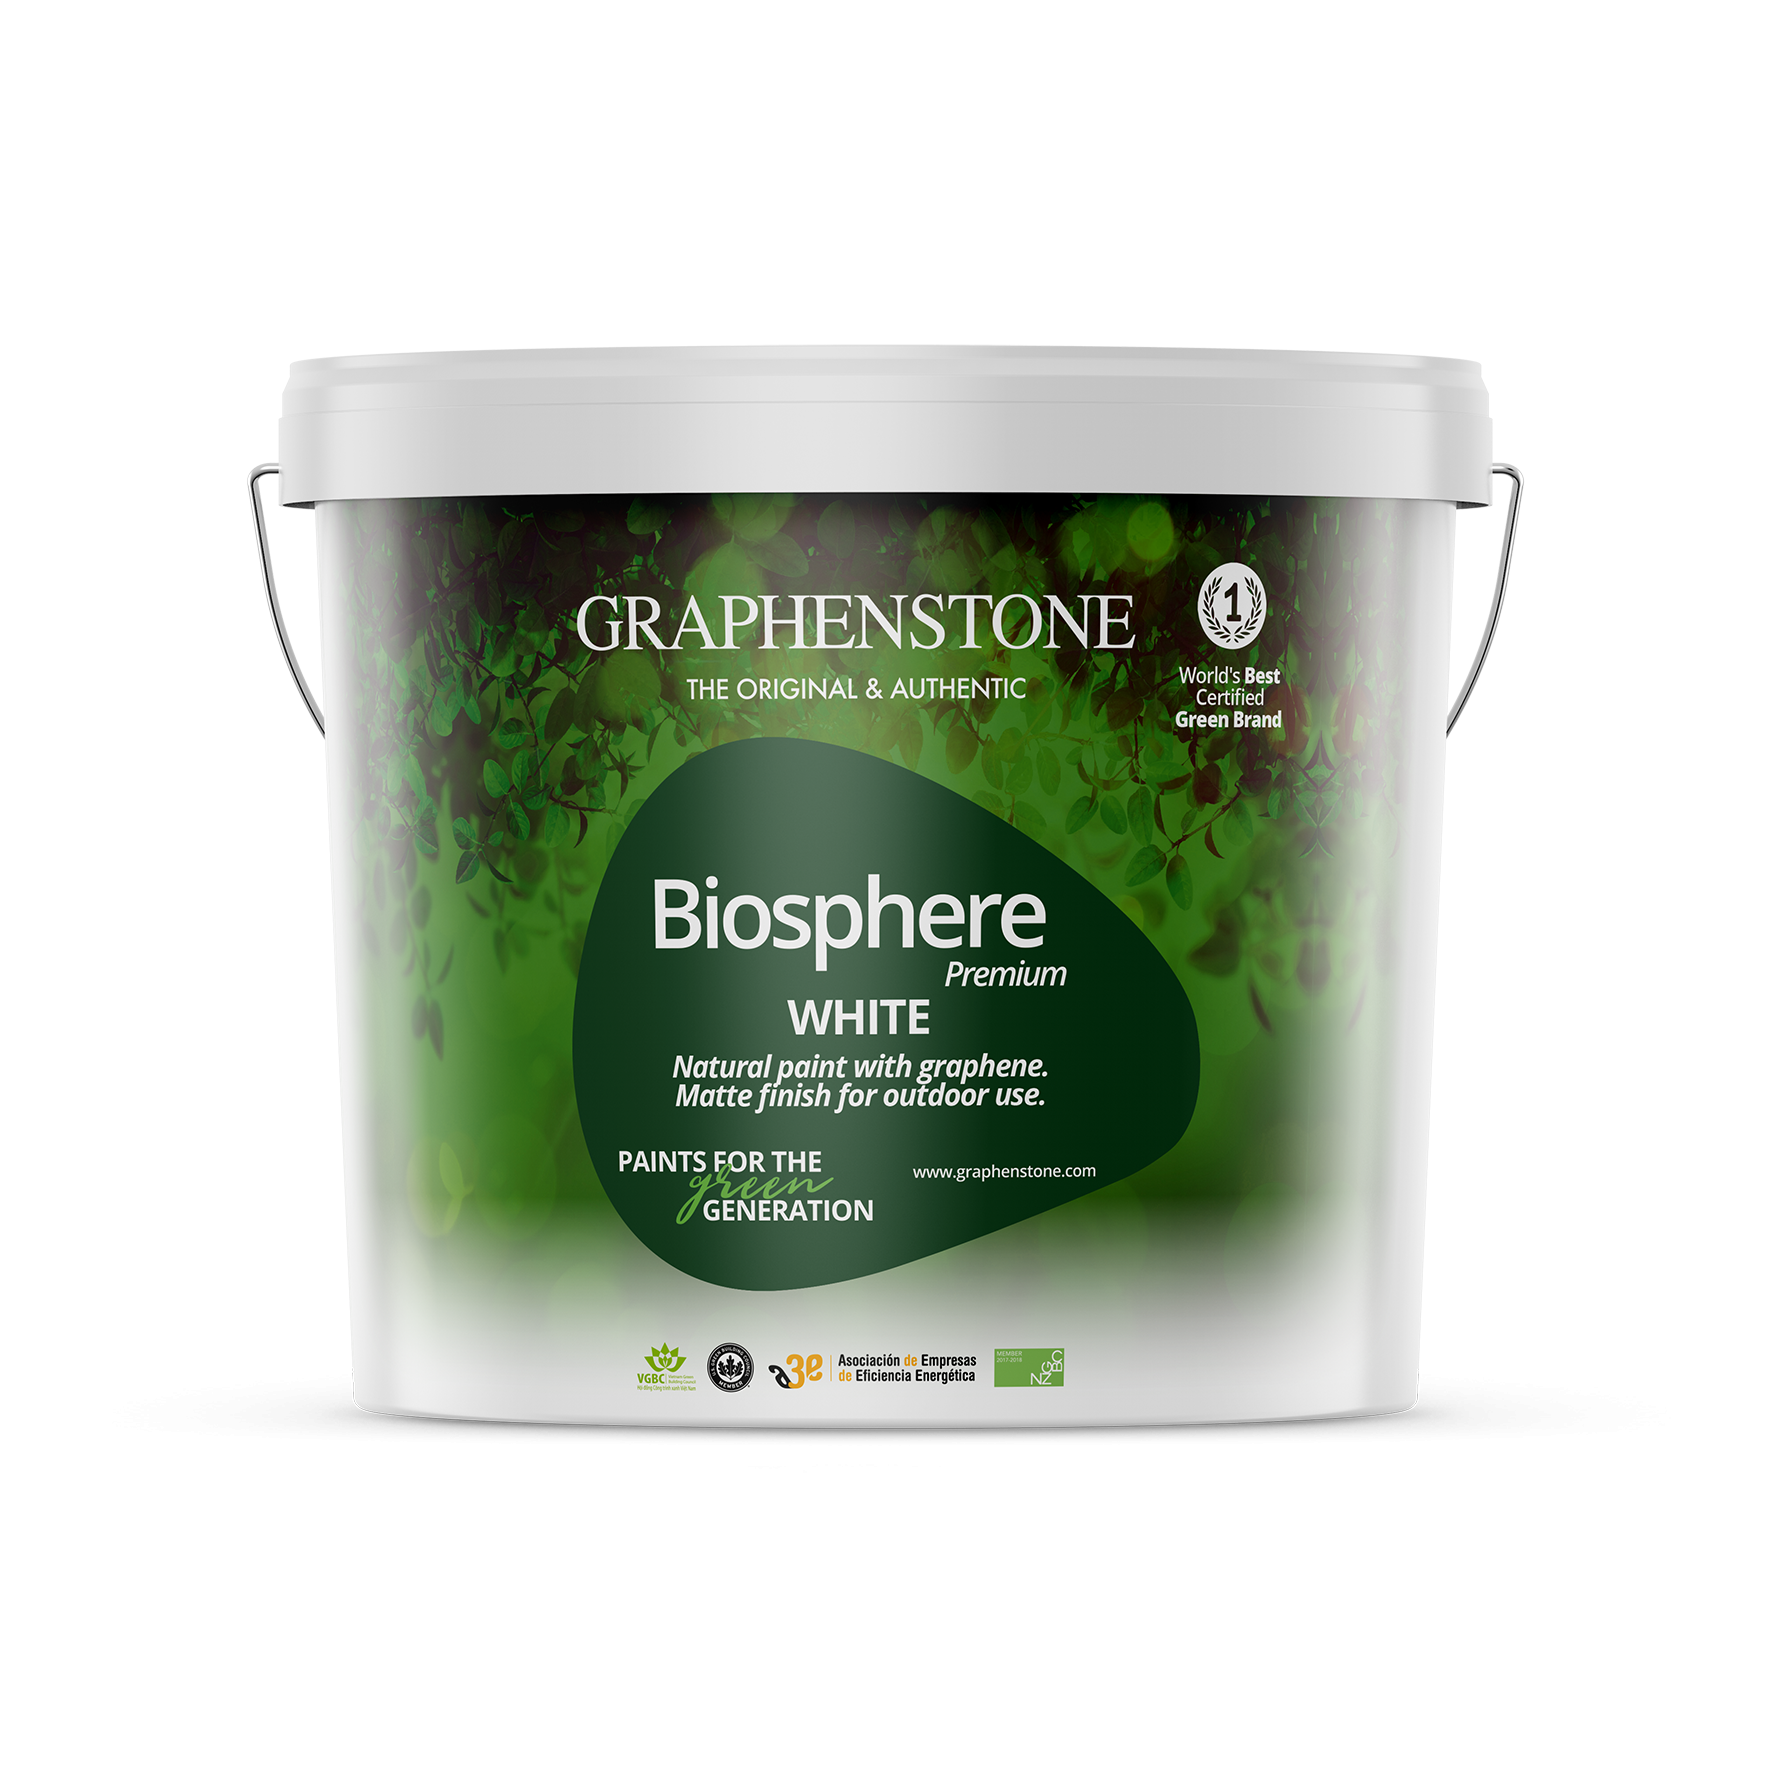 Graphenstone Biosphere Premium - White External Paint